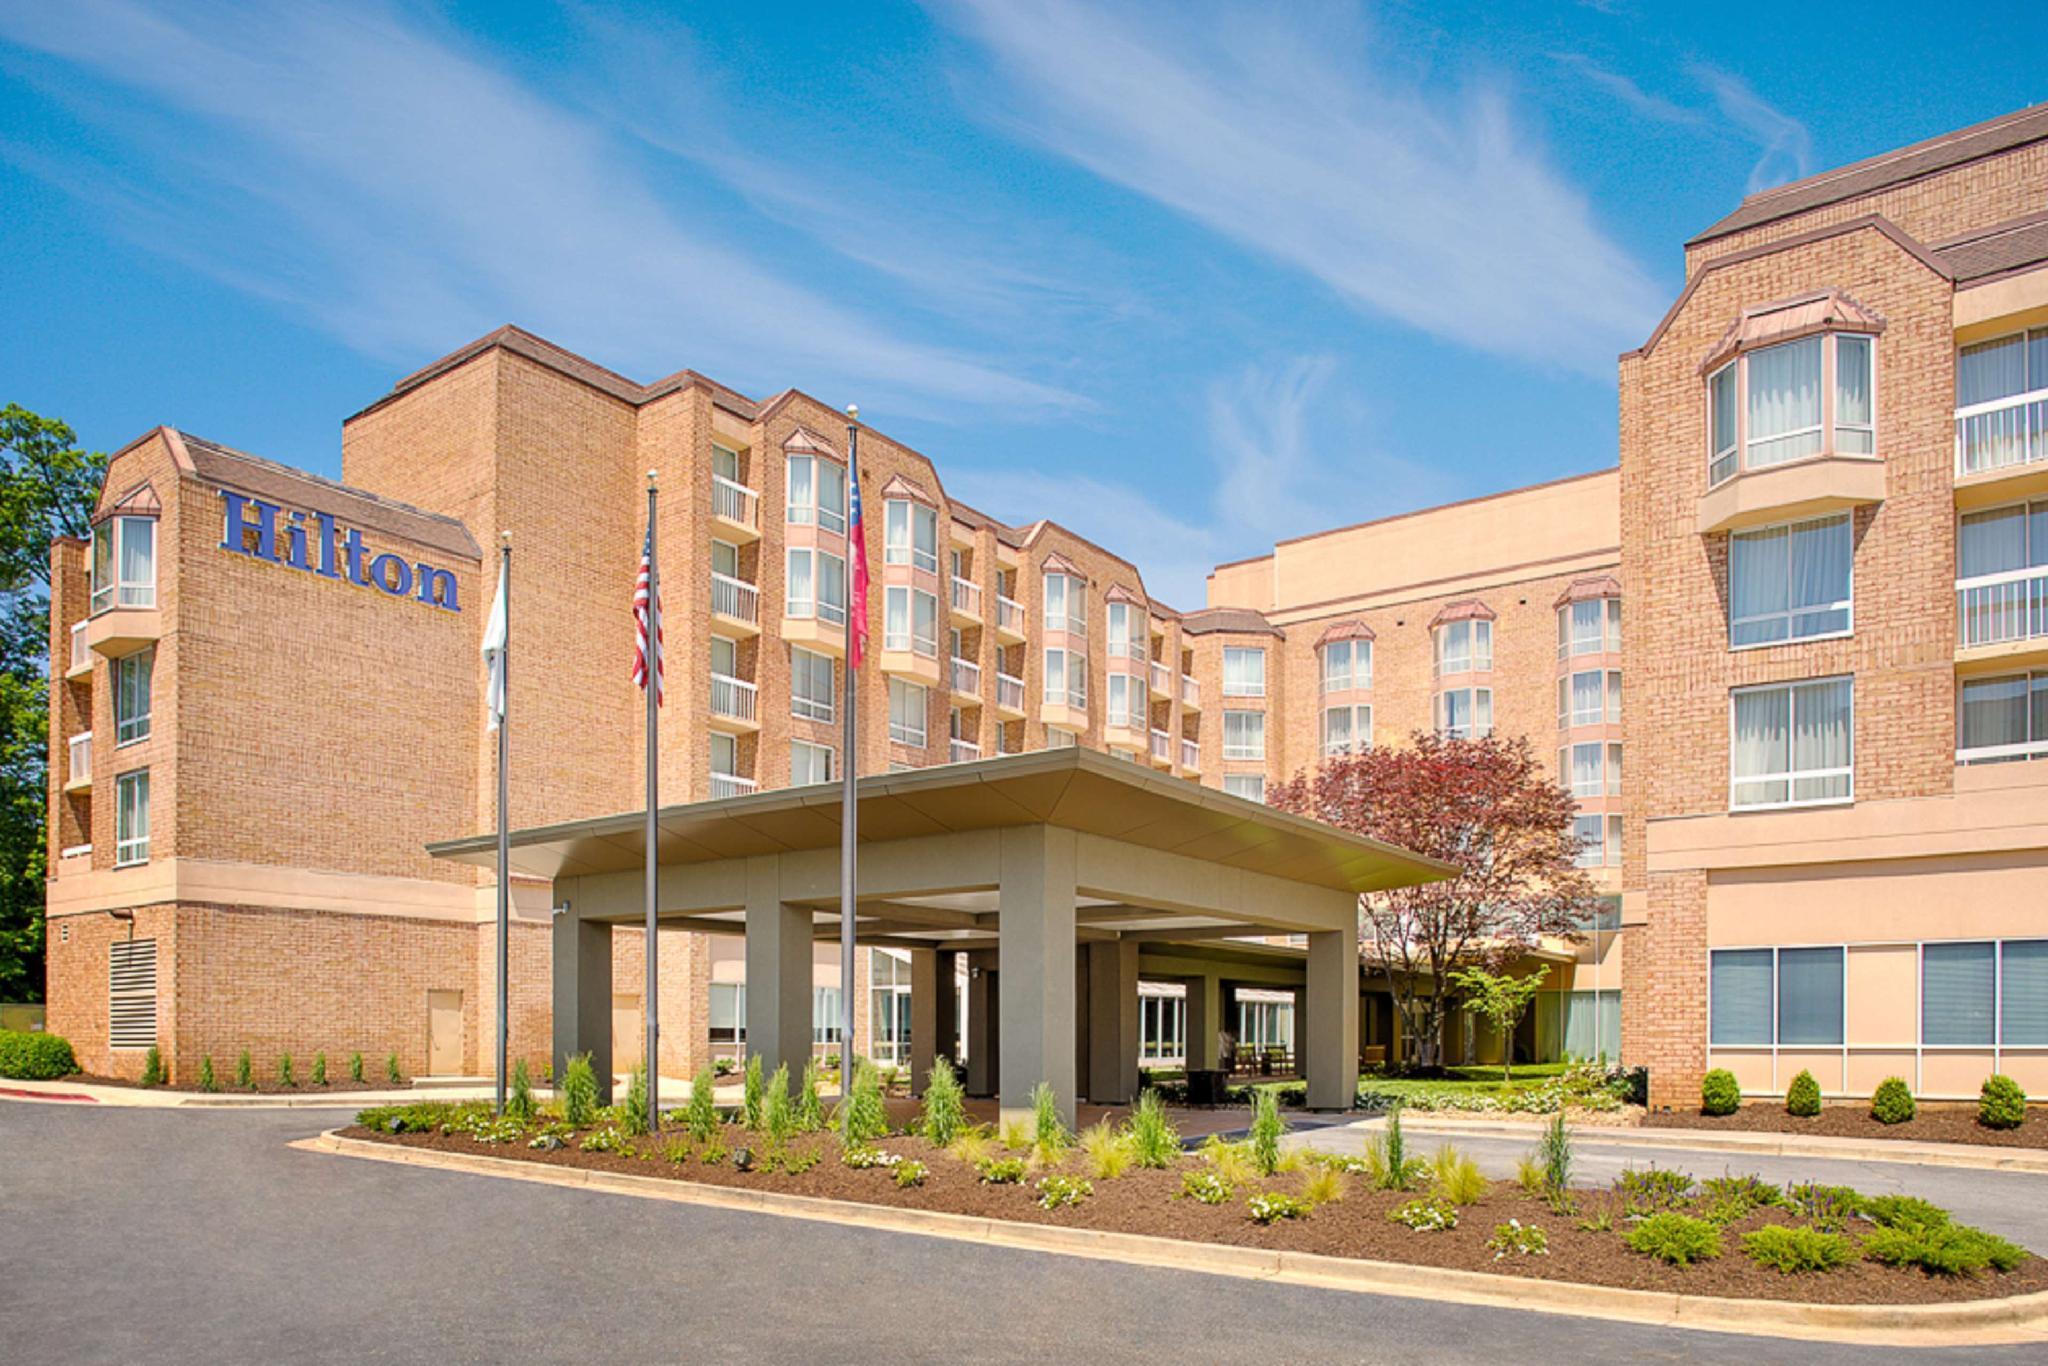 Hilton Suites Atlanta Perimeter